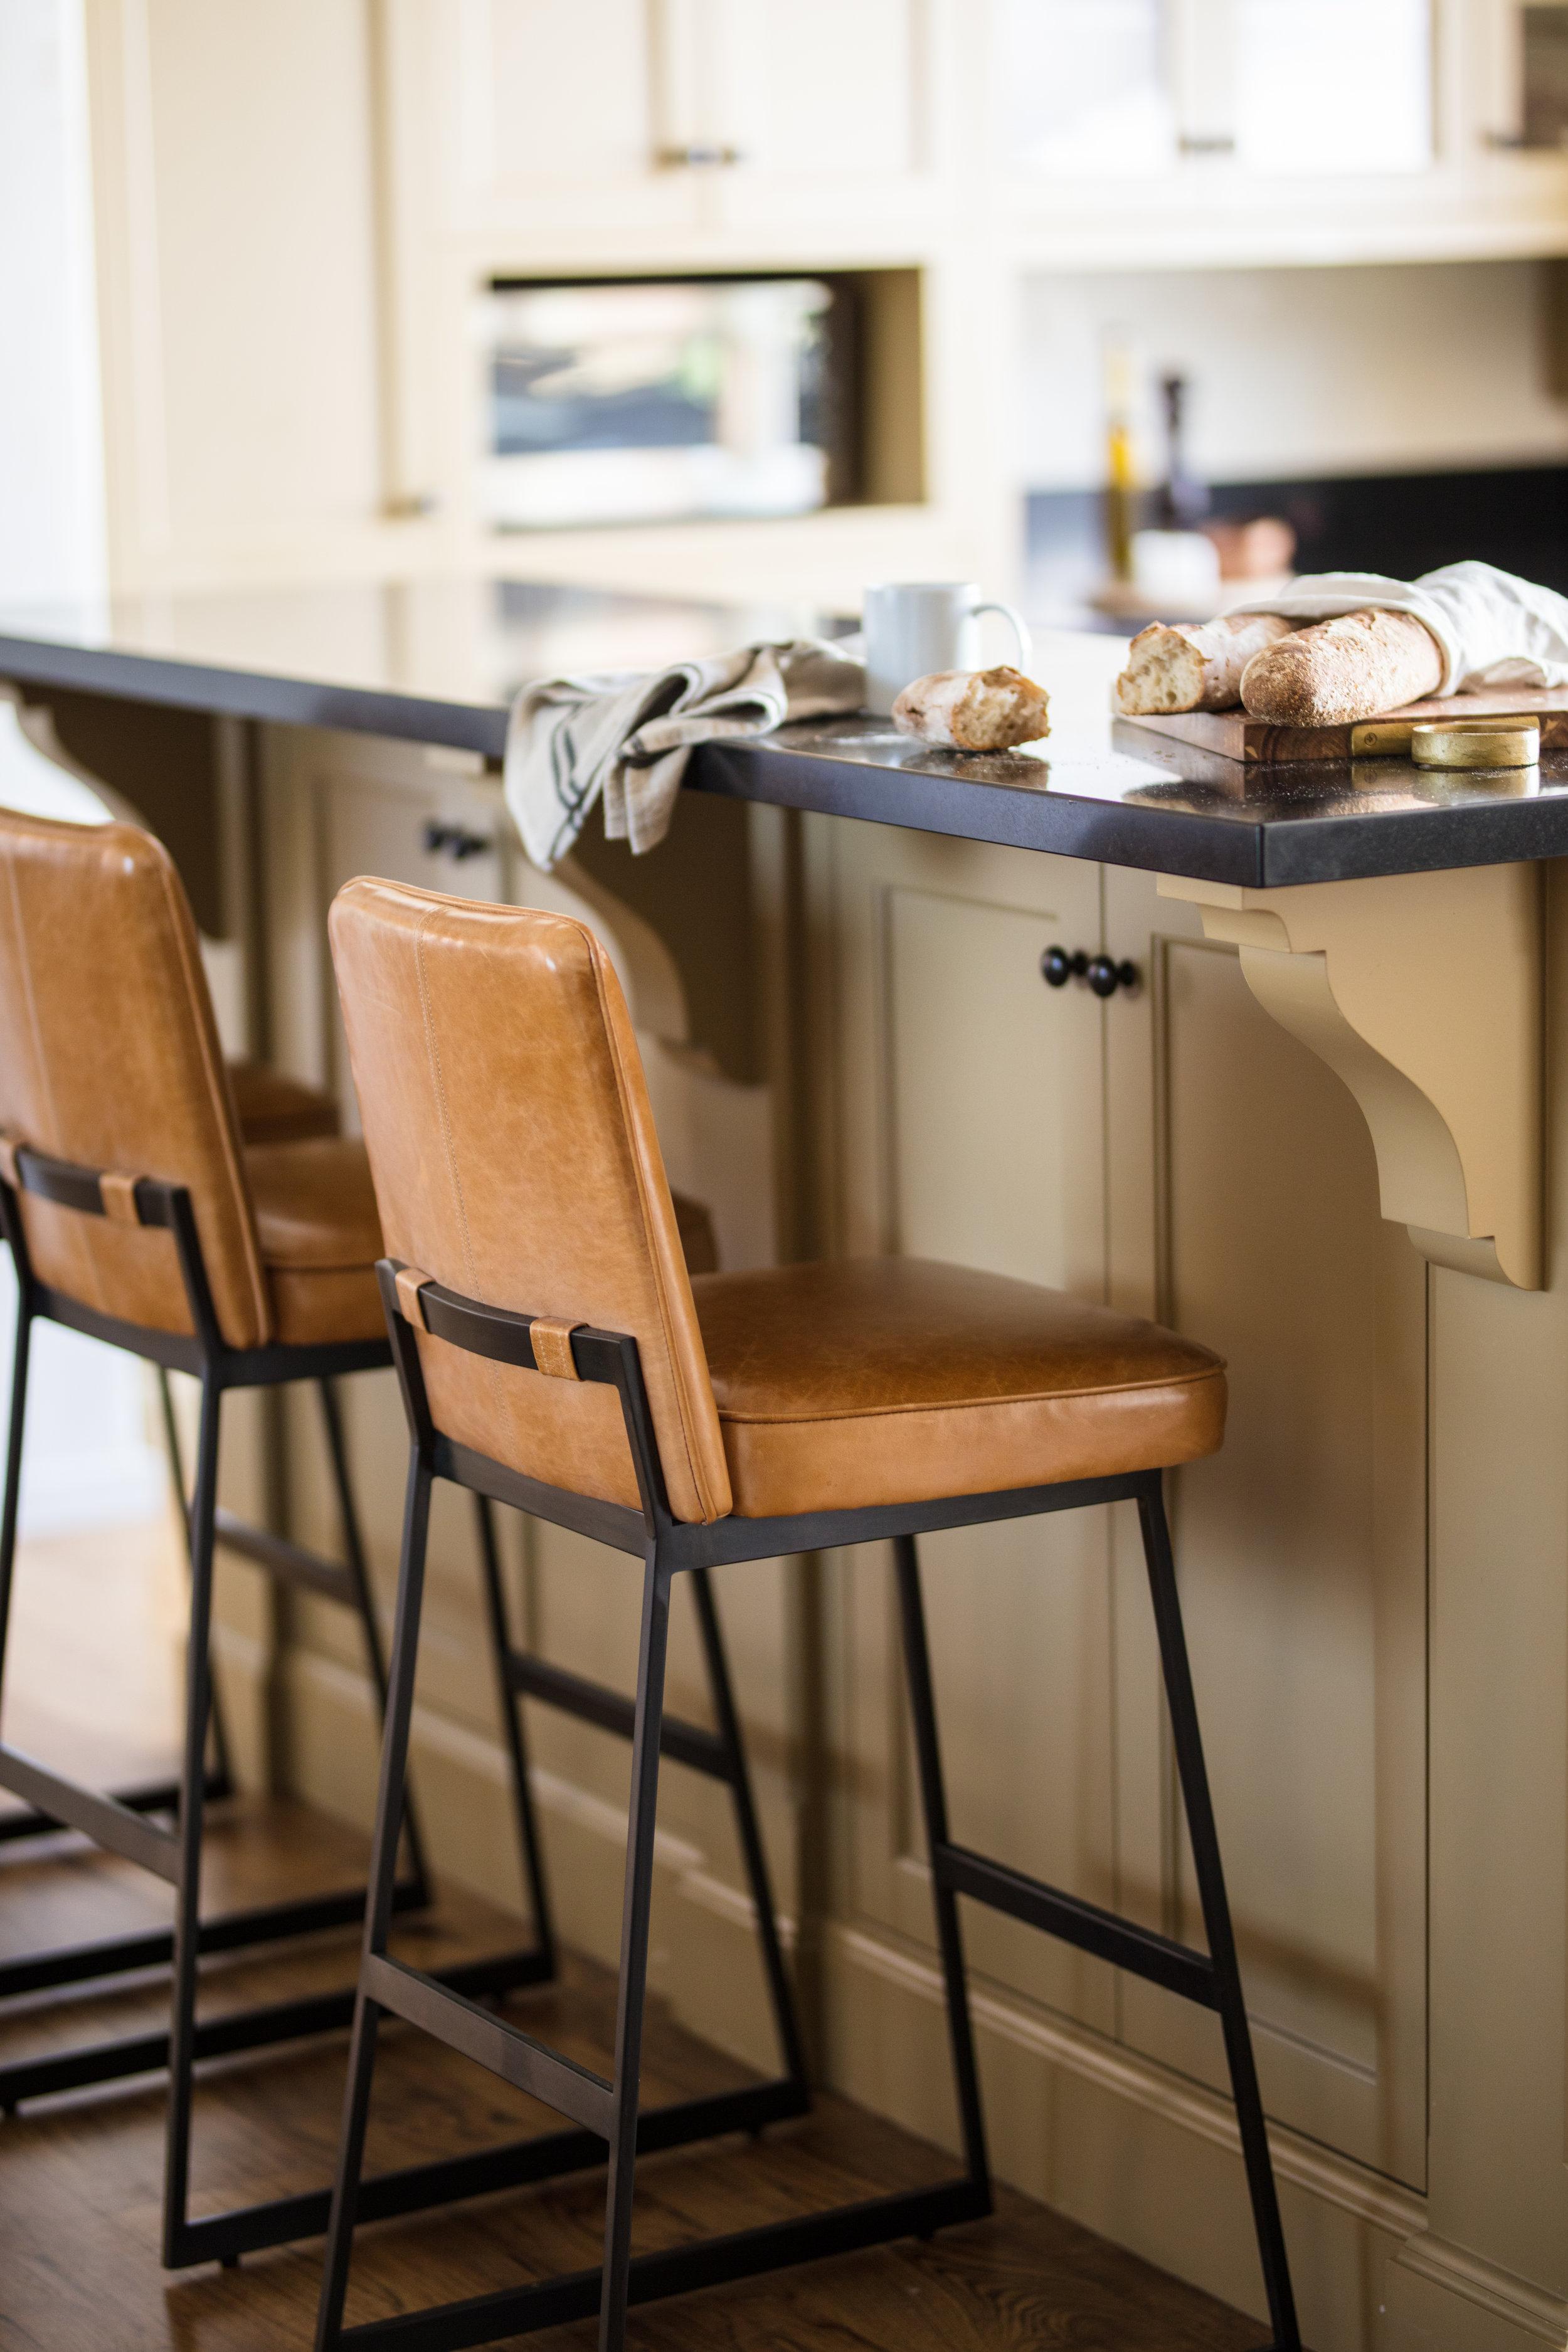 Fletcher Rhodes Interior Design, Kitchen Style, Leather Barstools, Wine Country Kitchen, Kitchen, Farmhouse Style